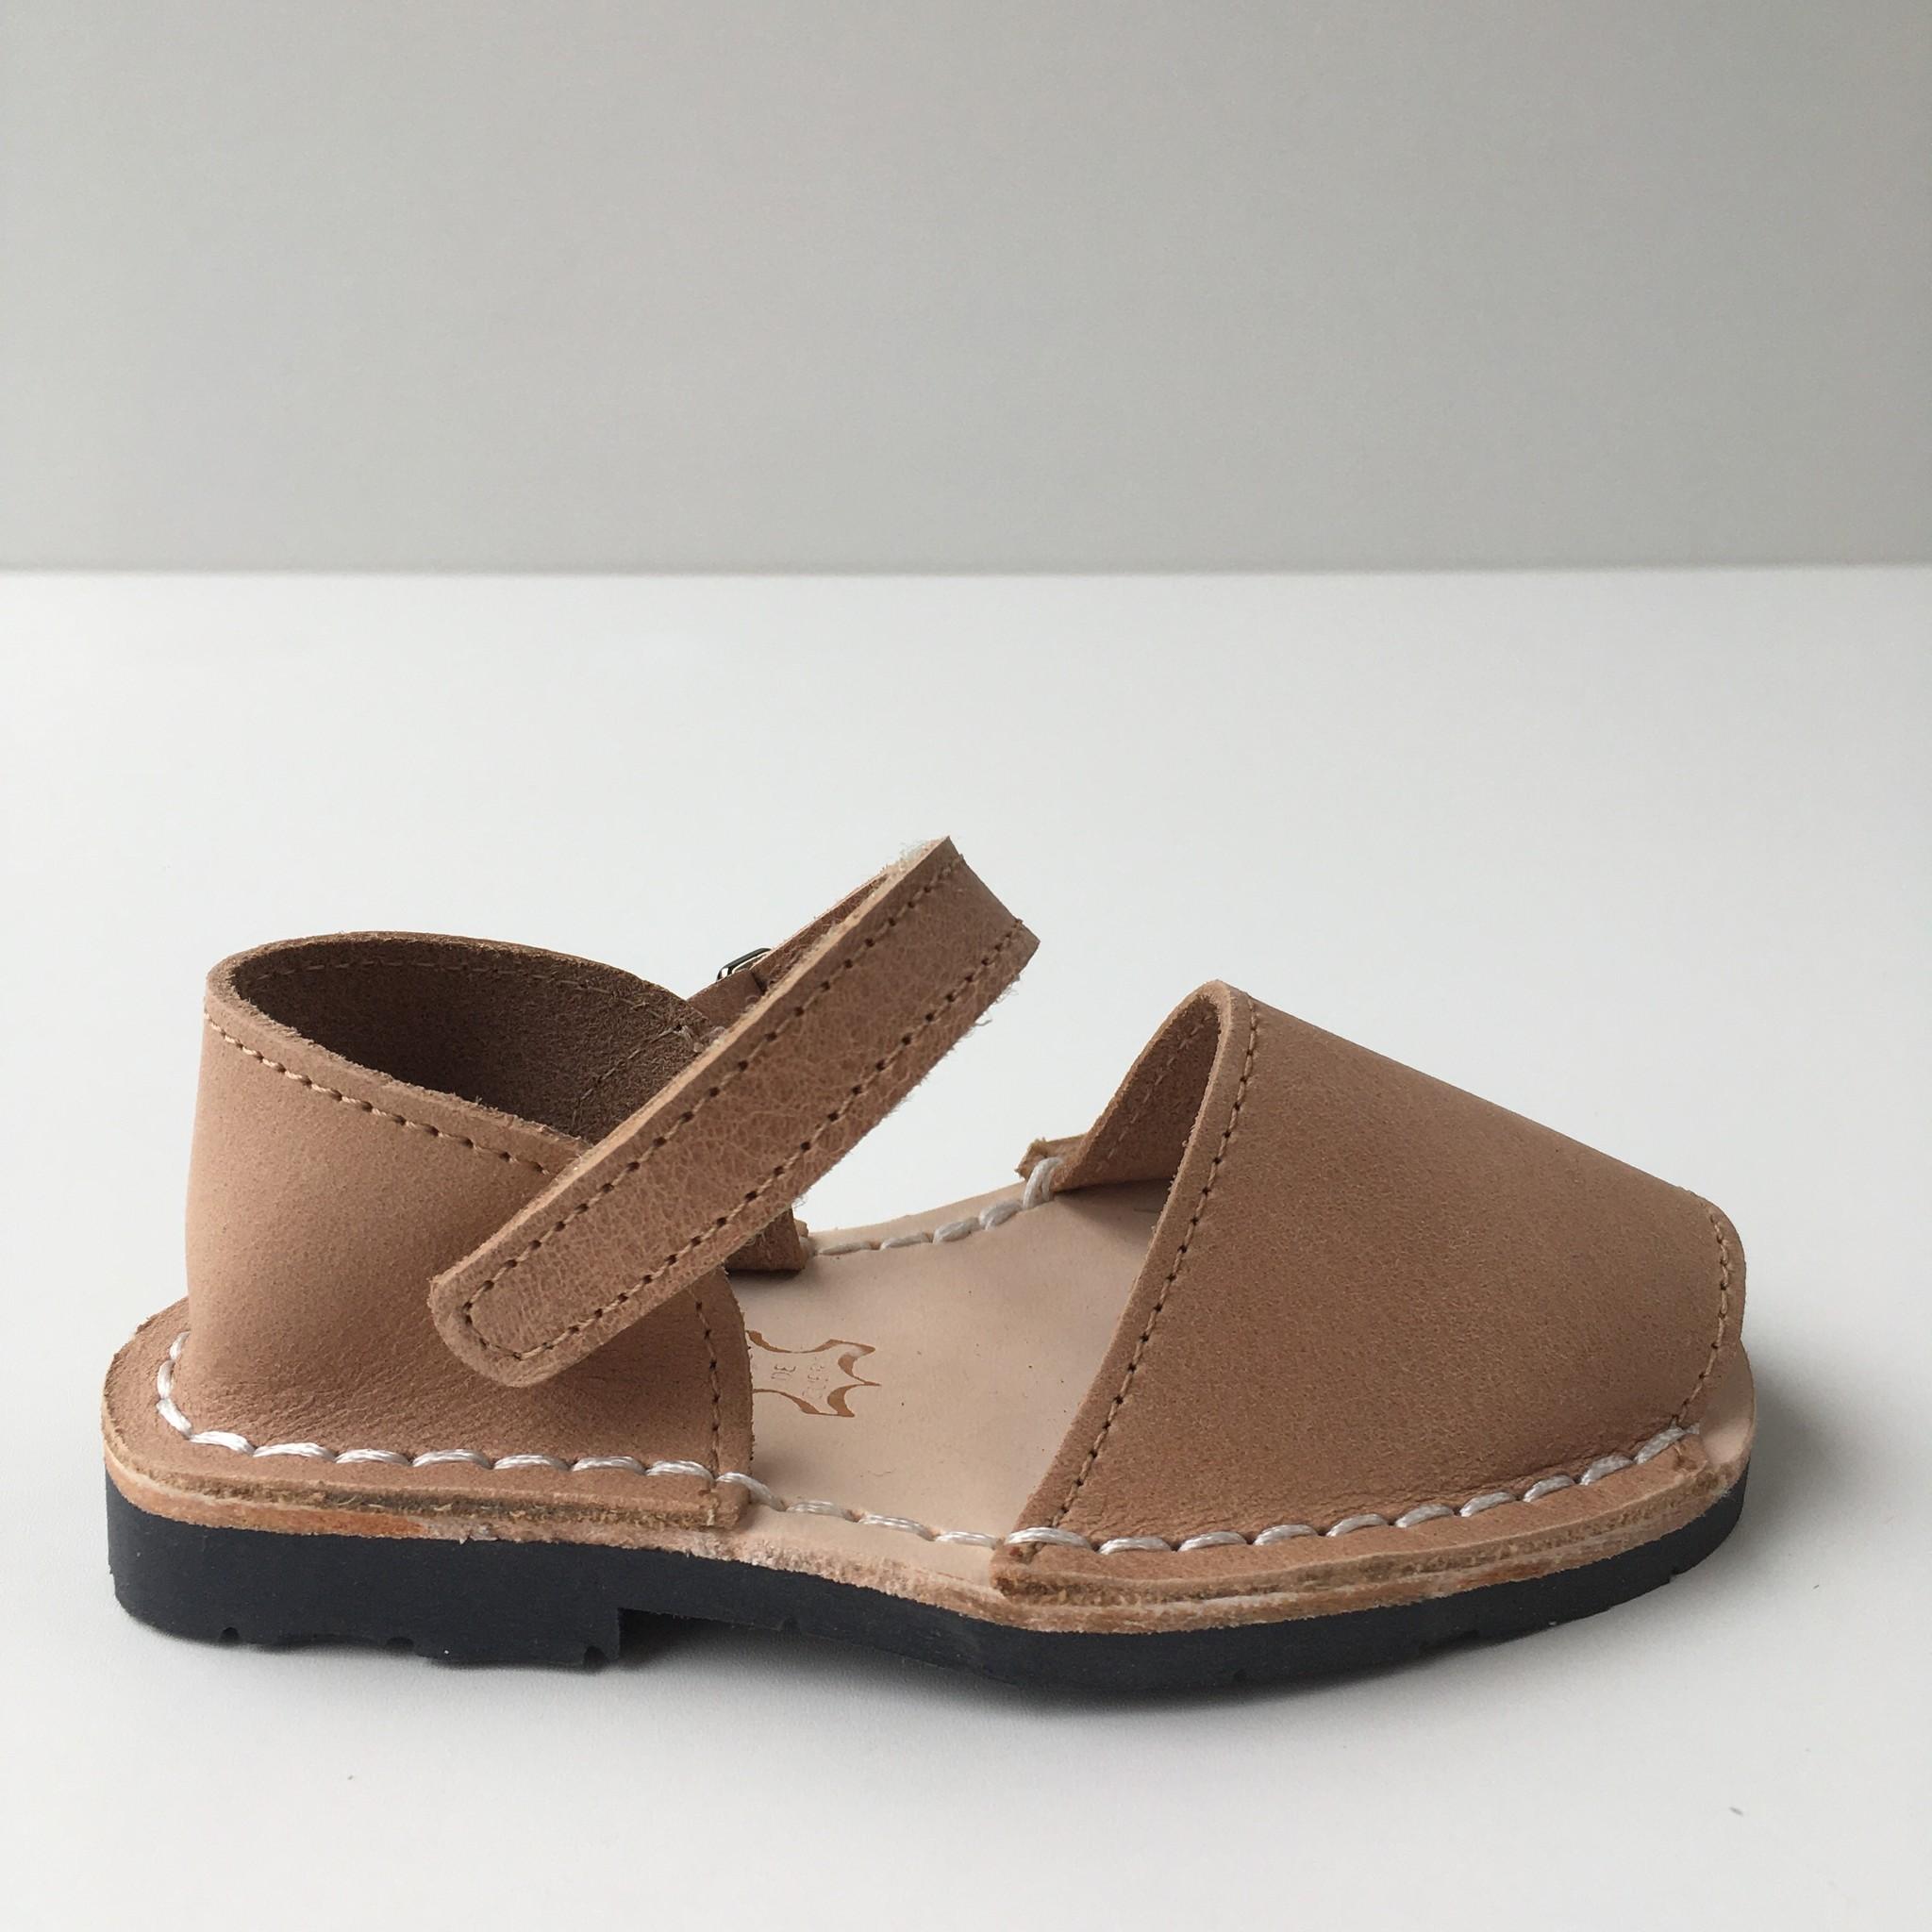 Pons  leather avarca sandal child BOSQUE - tan beige - 22 to 25